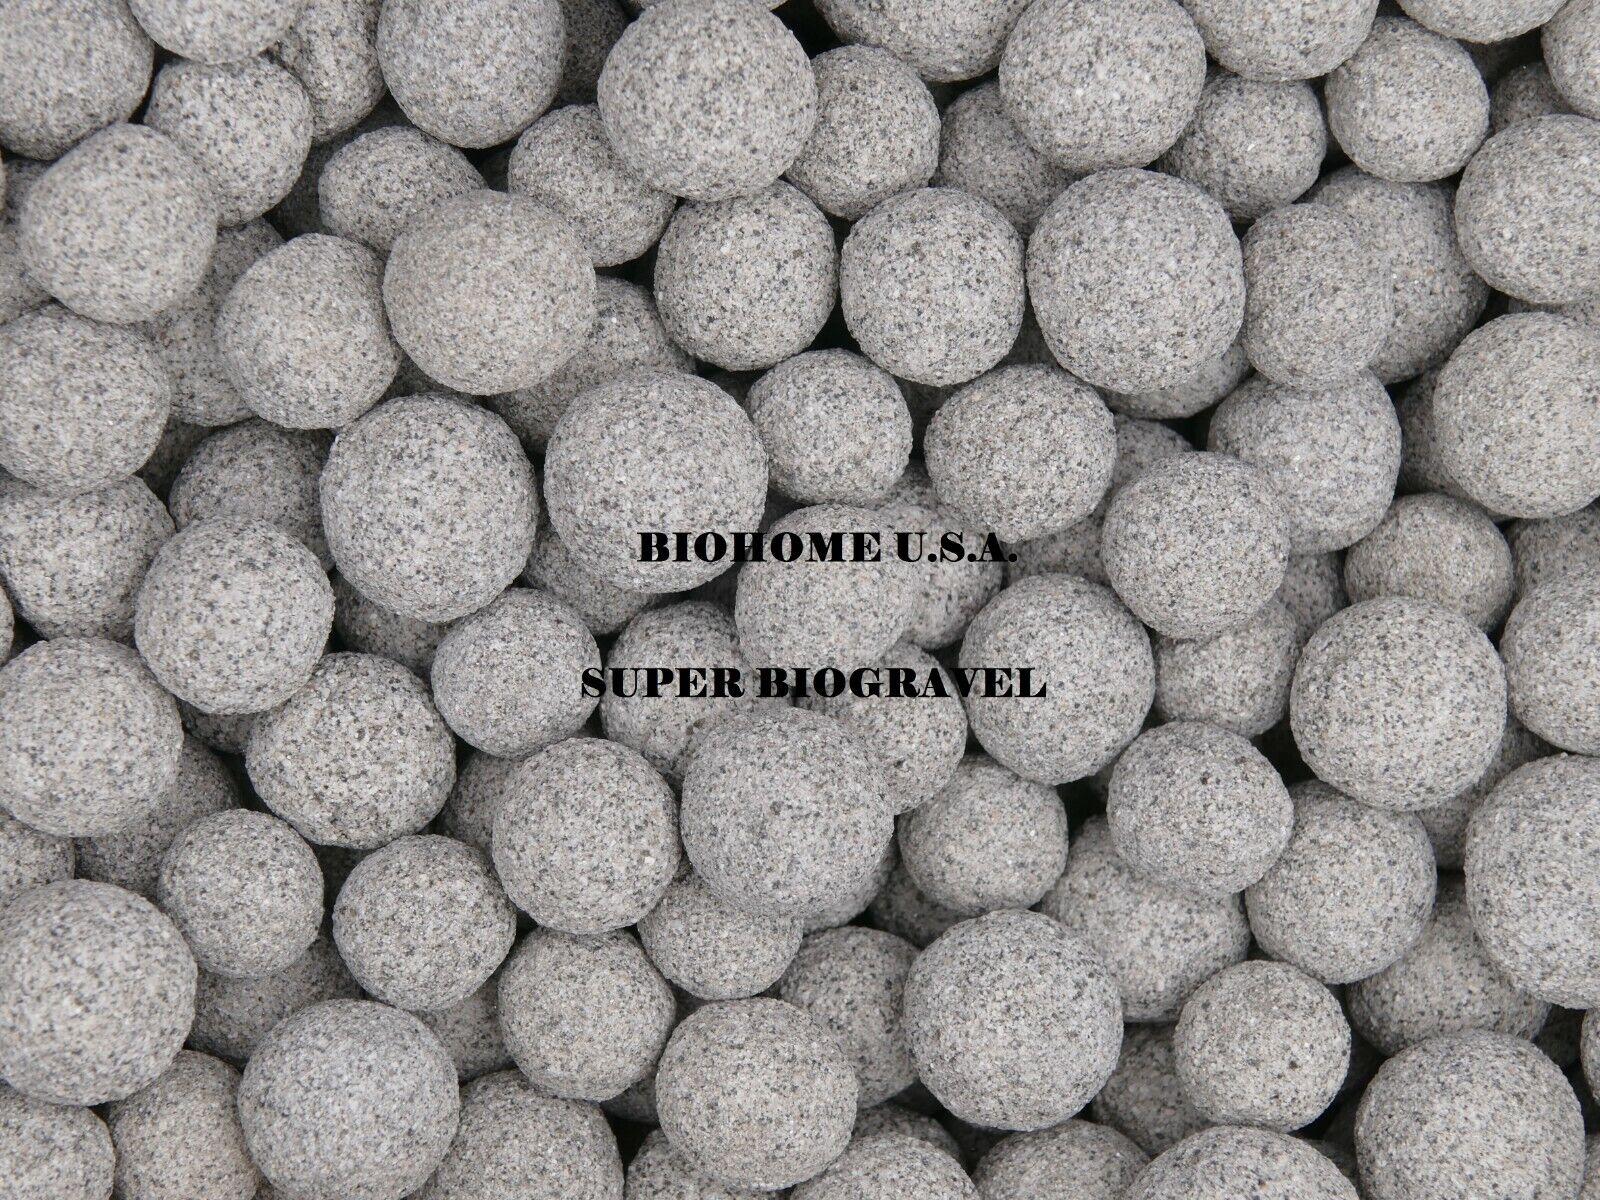 10 POUND BIOHOME SUPER BIOGRAVEL FILTER MEDIA ~LG GREY SPHERE~$13.99PP US SELLR